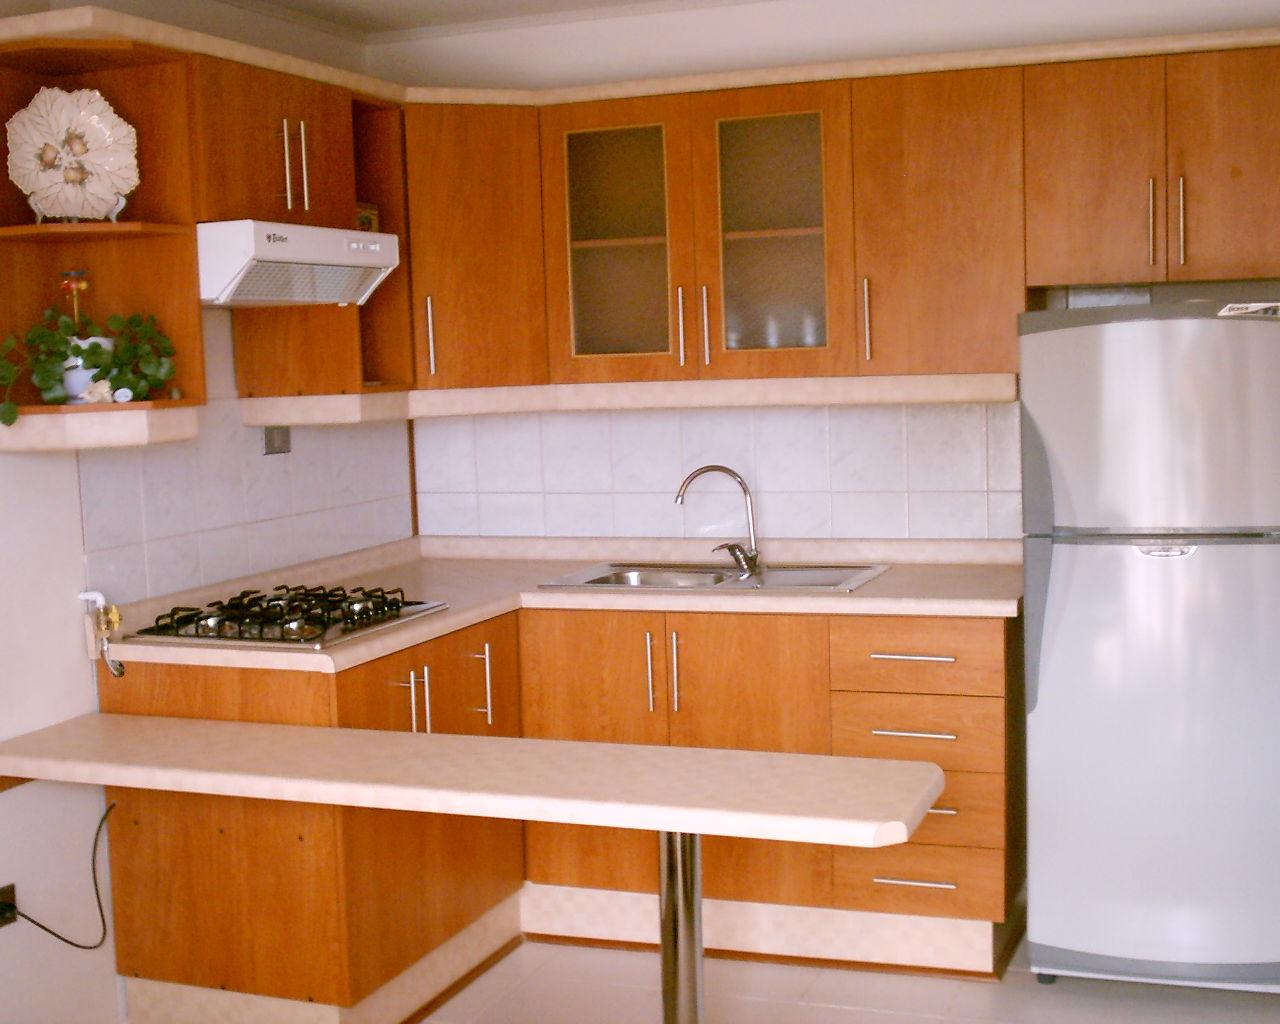 gabinetes de cocina peque a sencillos ideas